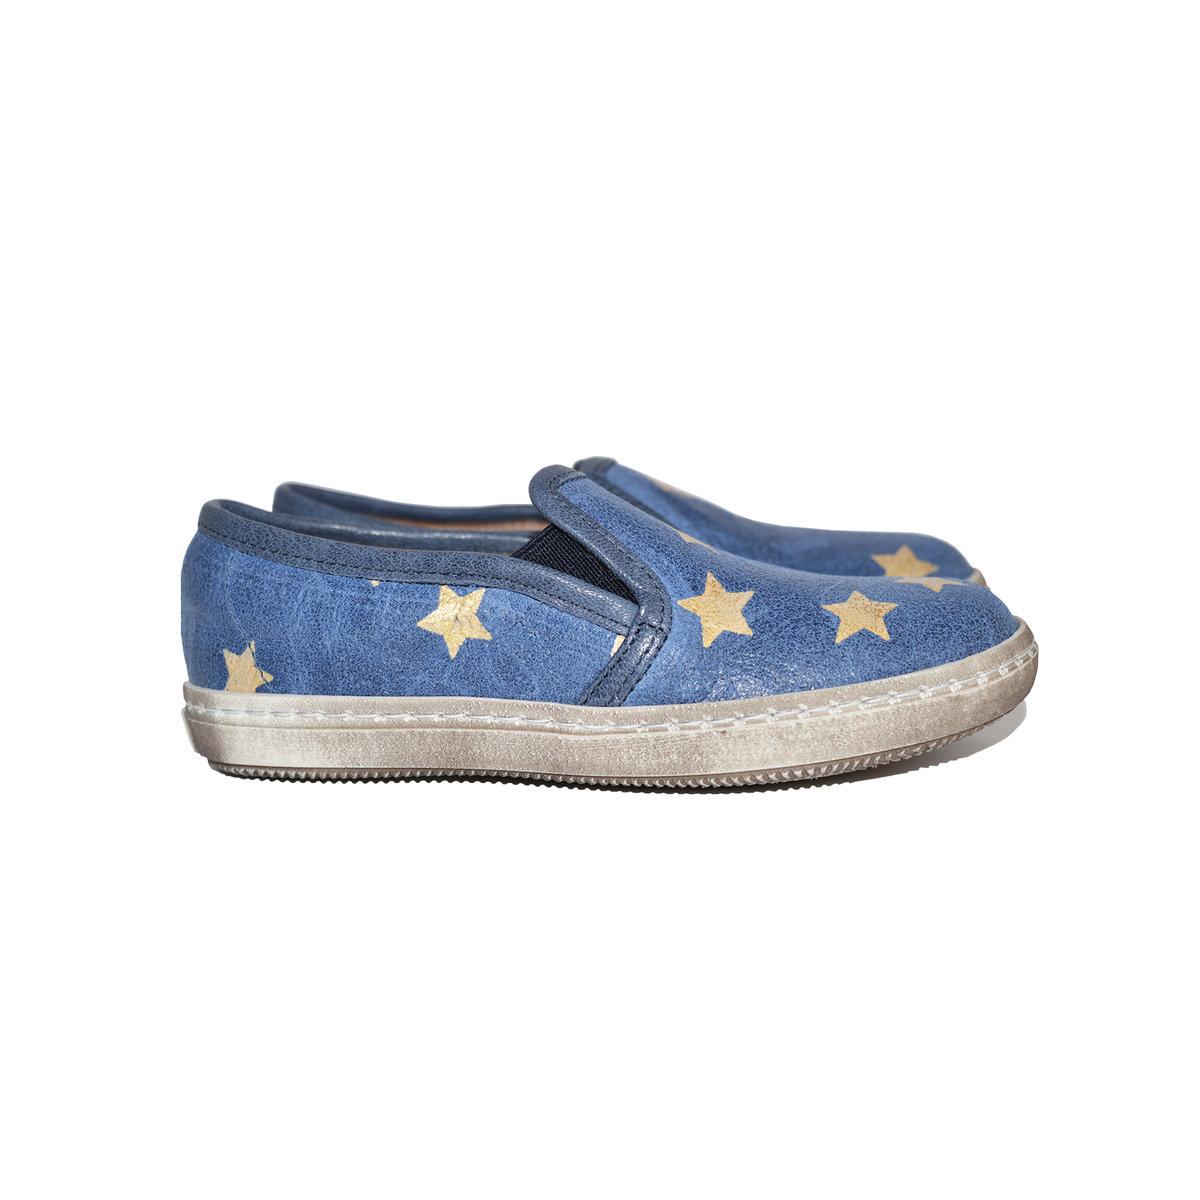 1c8c7542cf729 Slip-on Leather Shoes Thumbnail